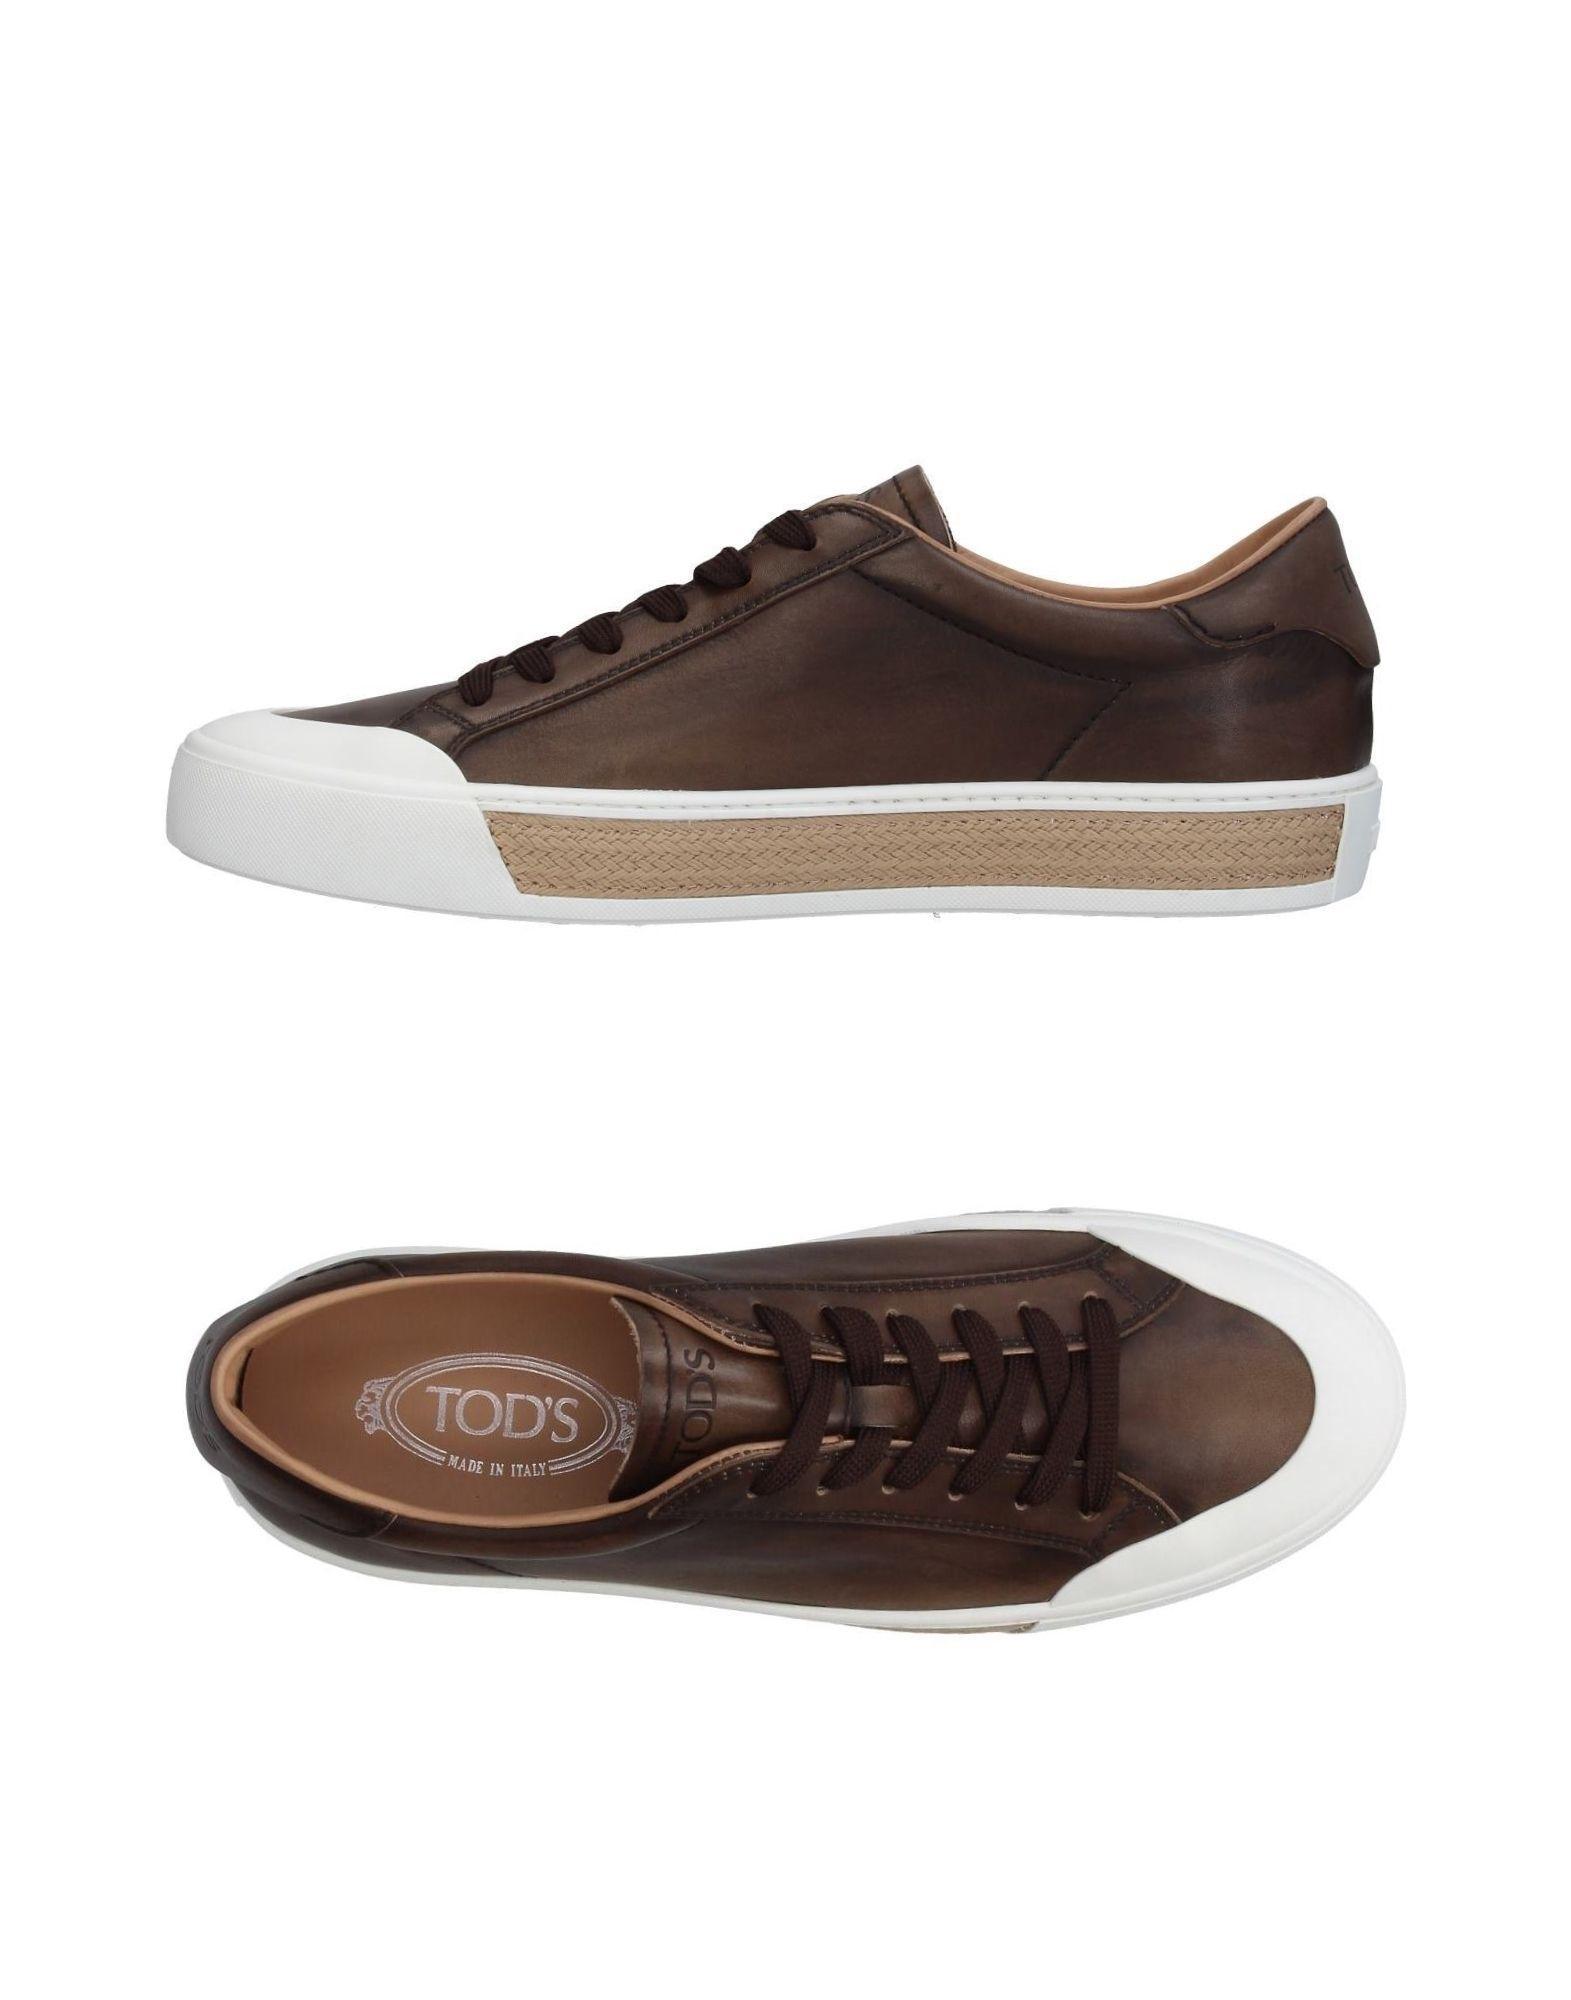 Tod's Sneakers In Khaki